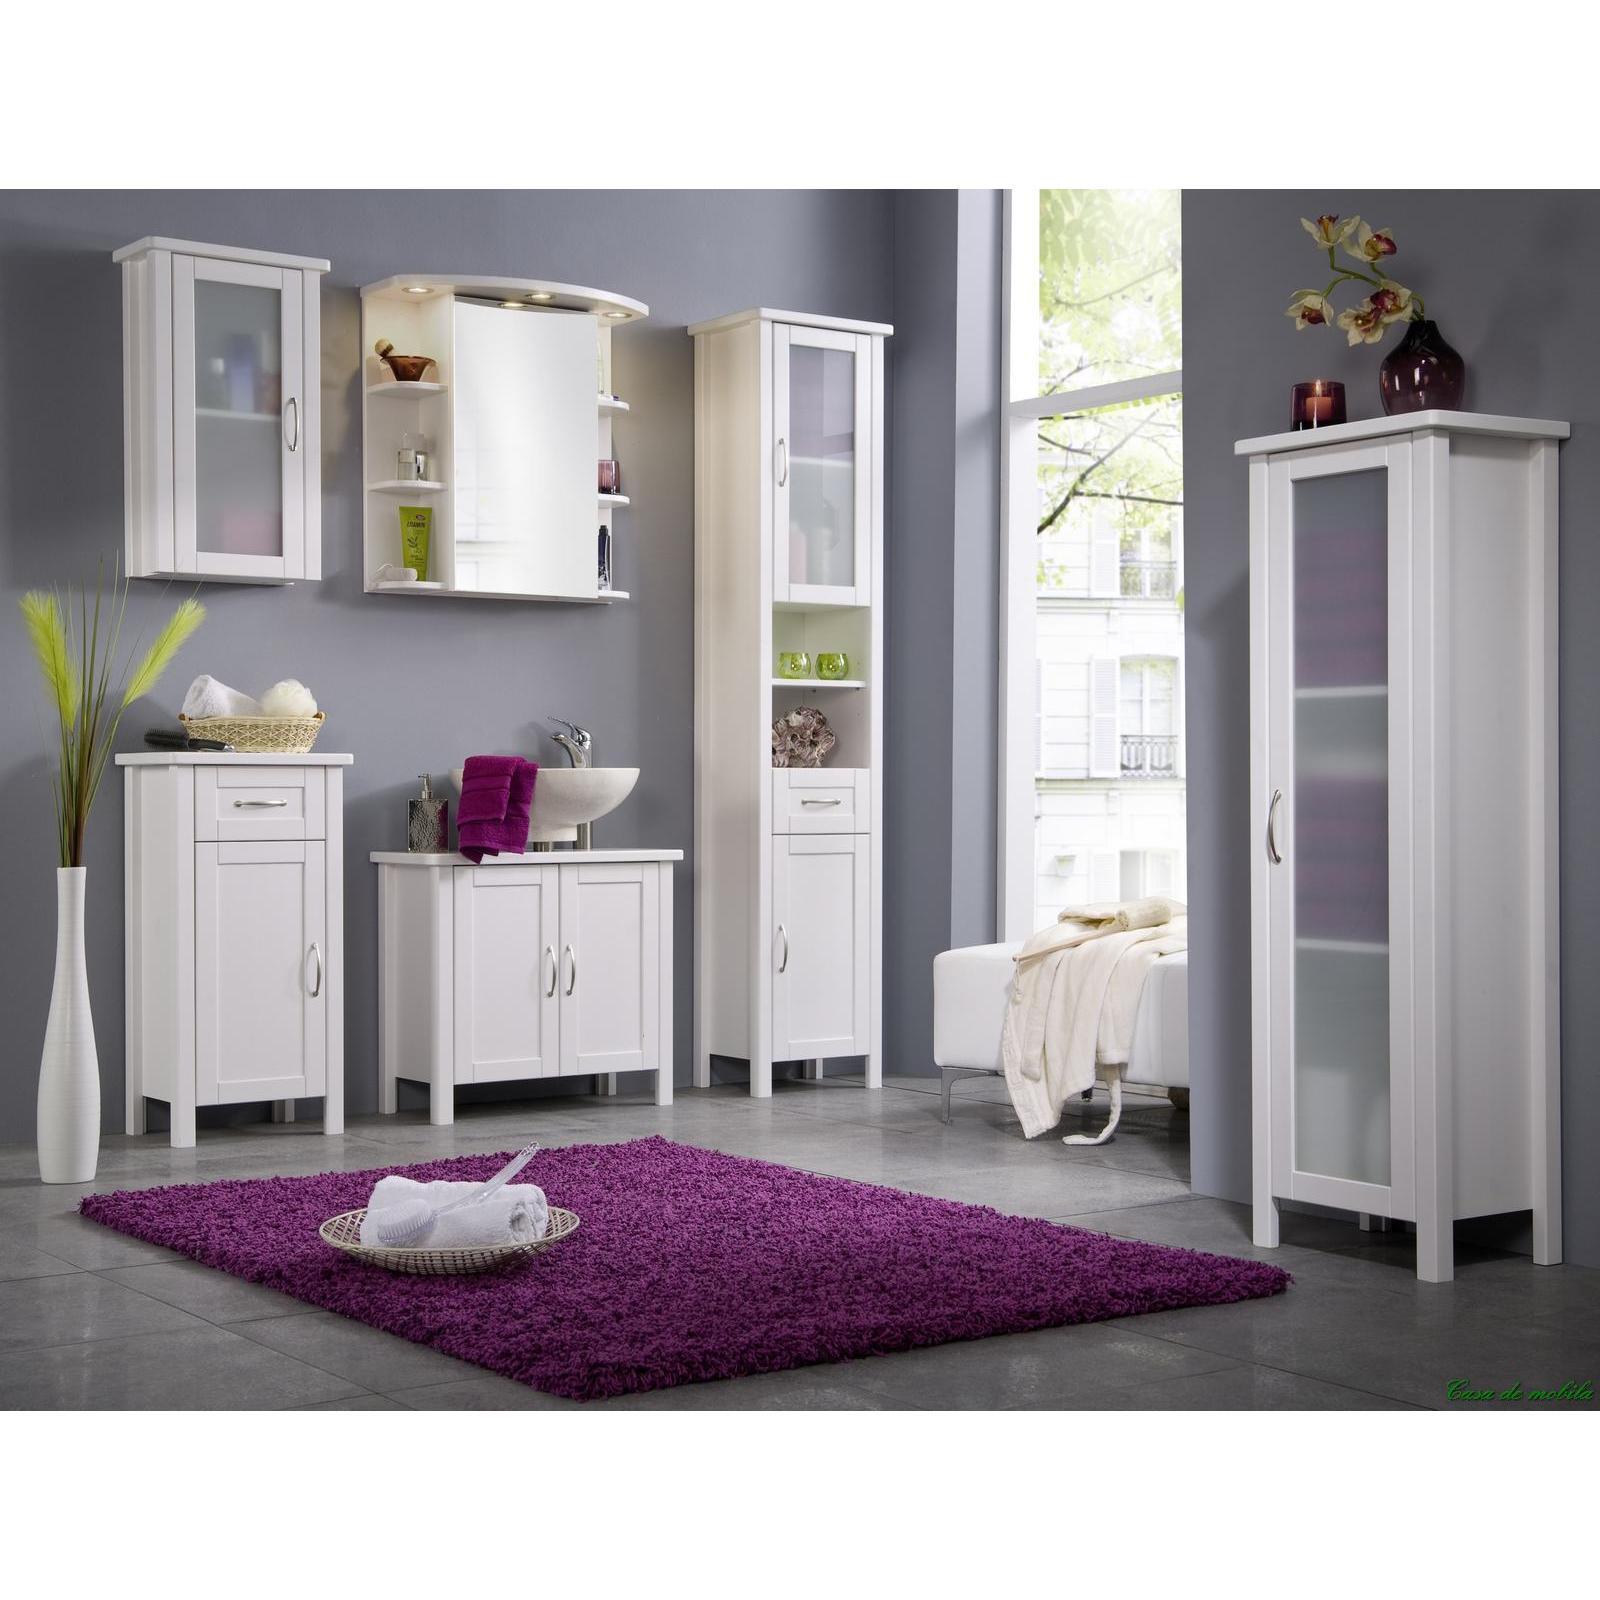 massivholz bad schrank badezimmerschrank hochschrank kiefer massiv. Black Bedroom Furniture Sets. Home Design Ideas